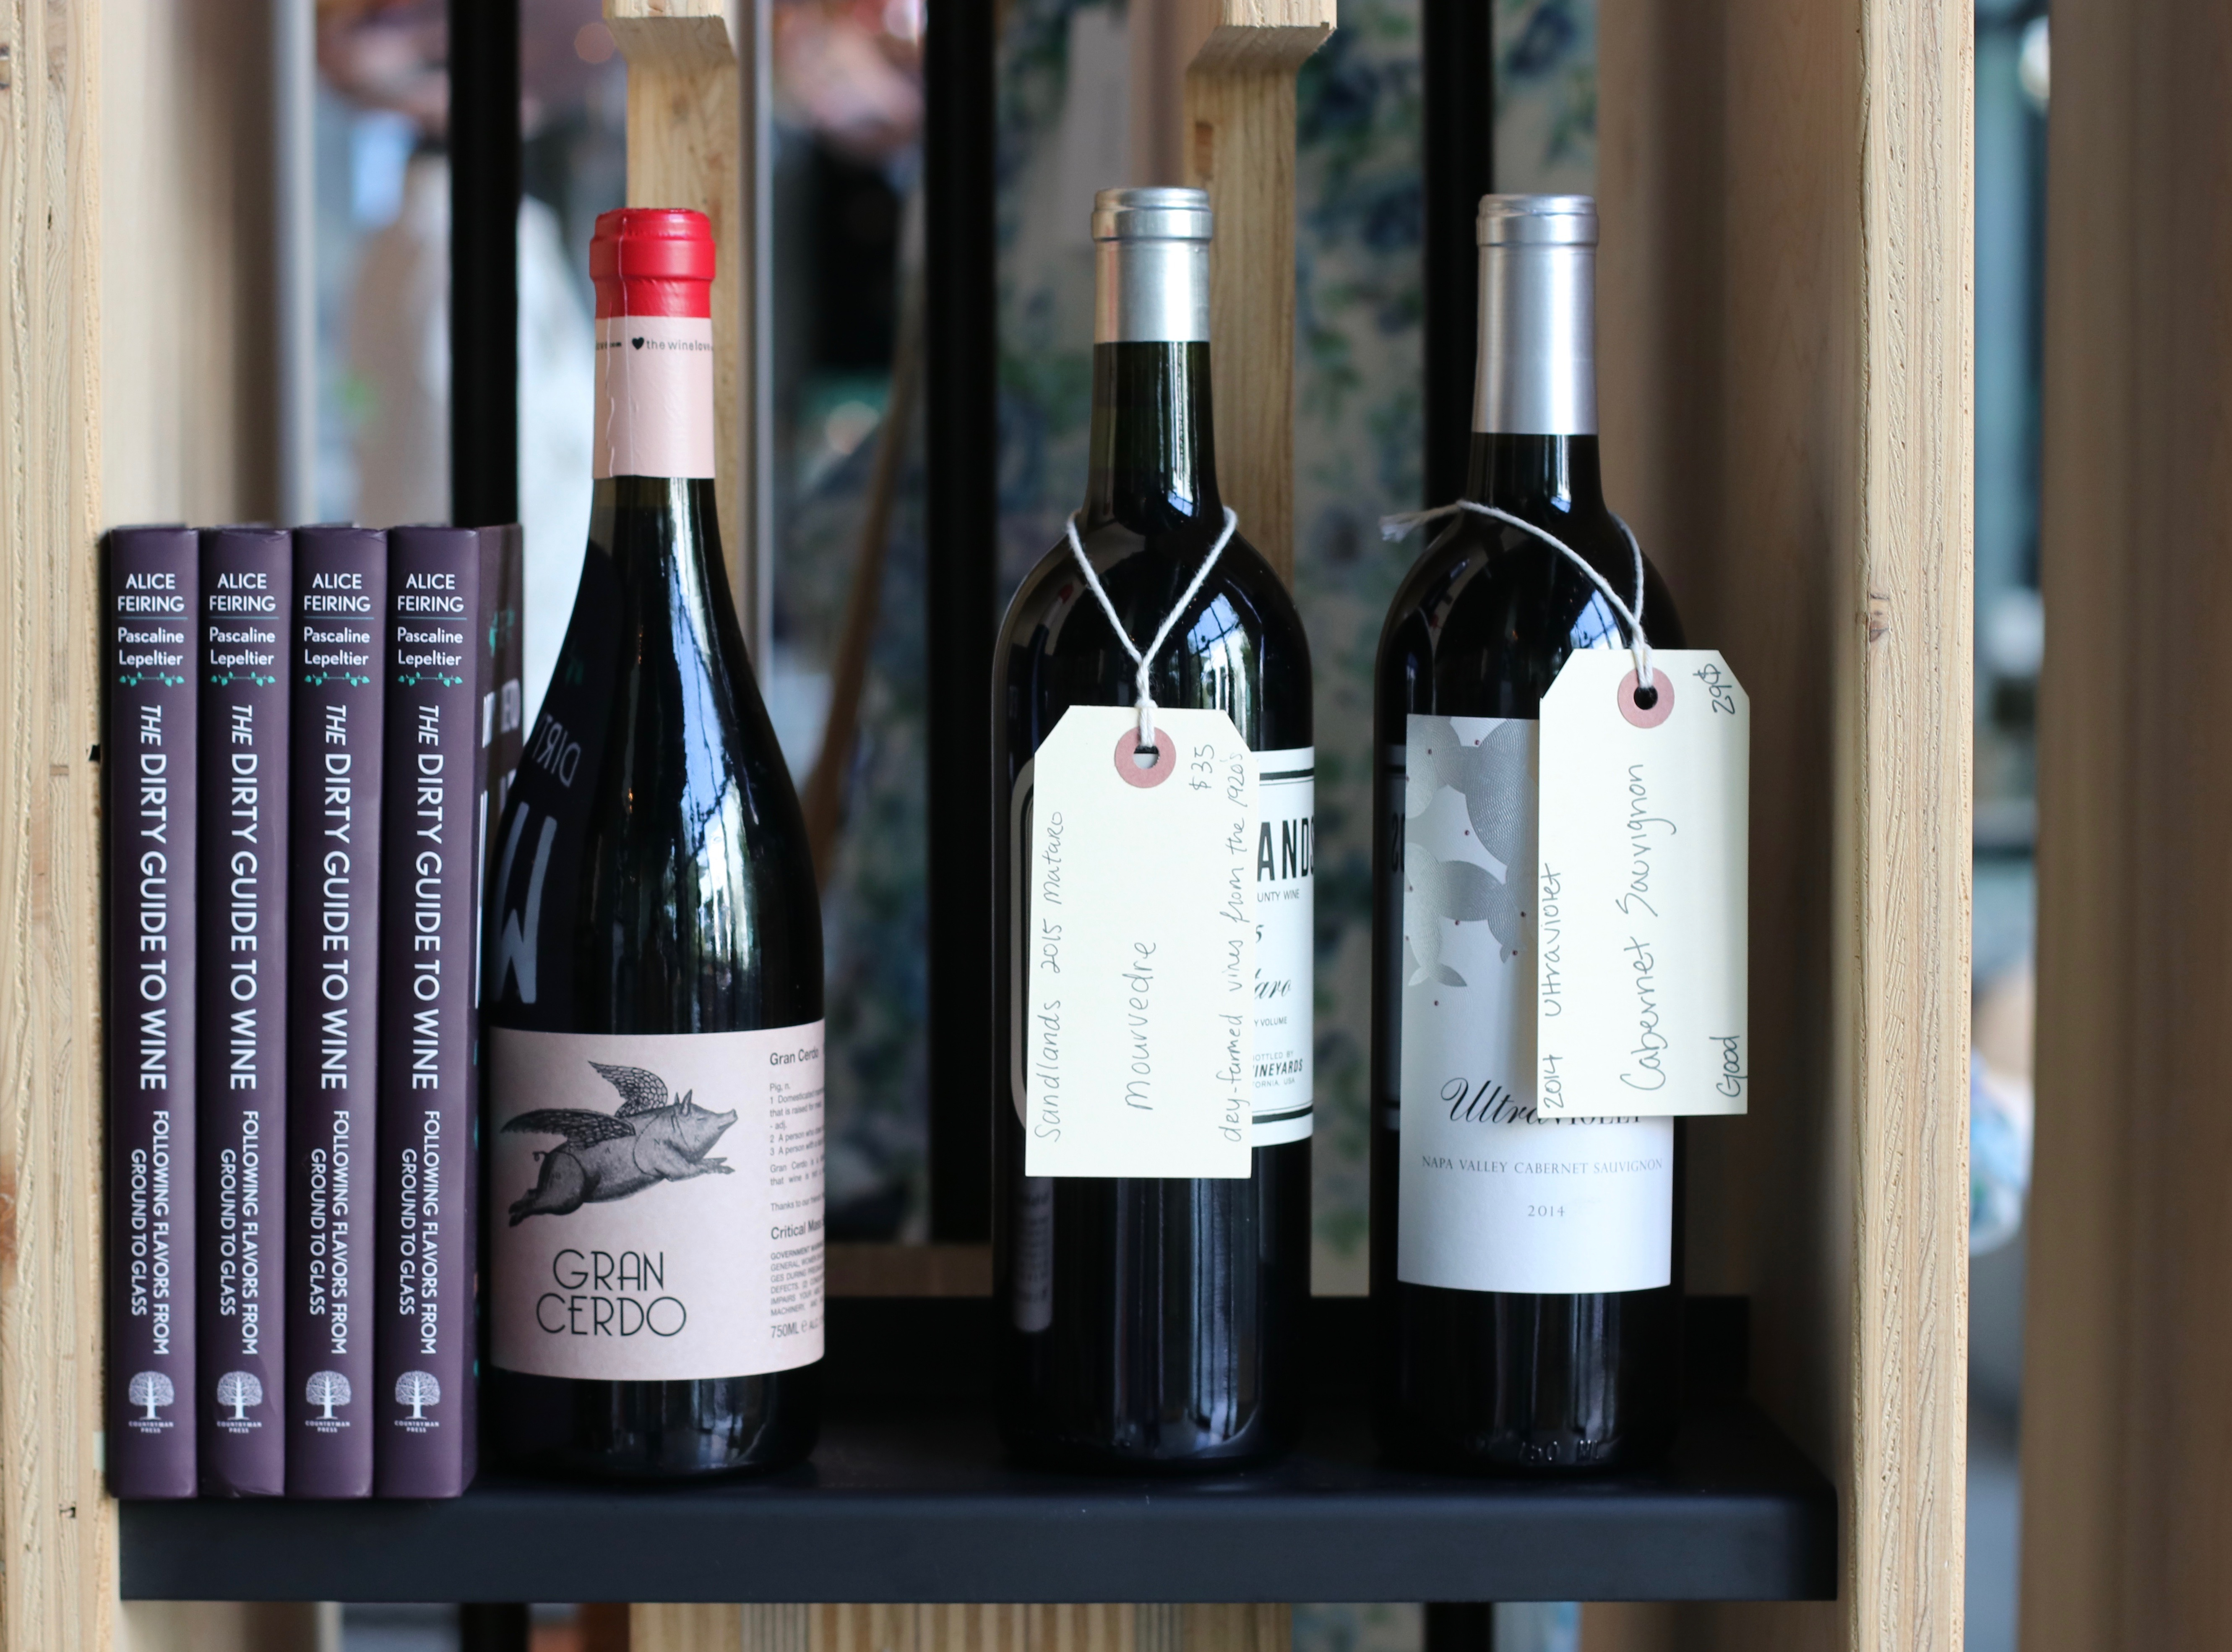 Wine bottles at Hayden, Culver City.